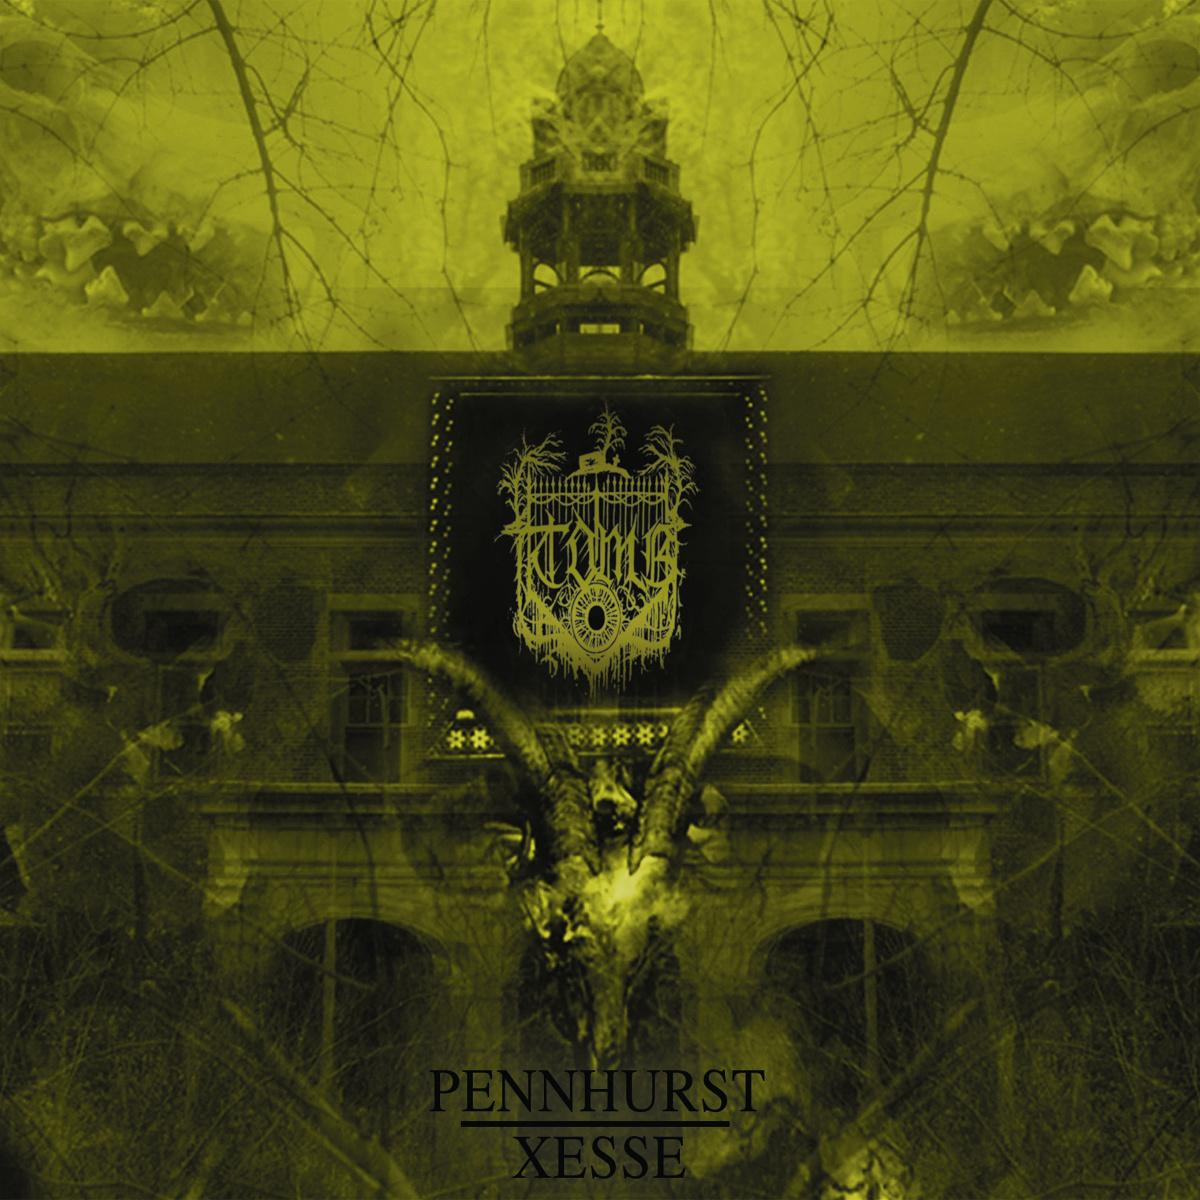 T.O.M.B. - Pennhurst / Xesse  CD - 画像1